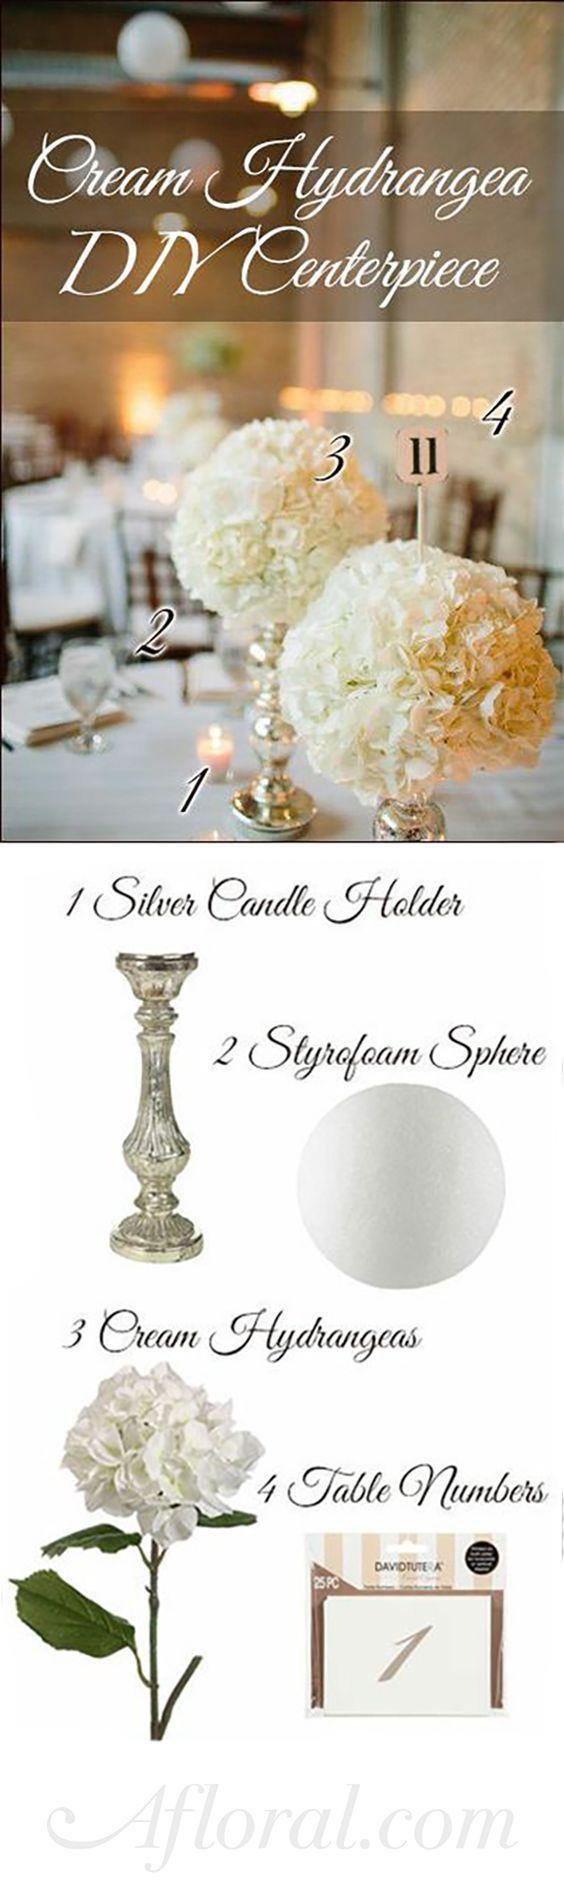 Best hydrangea centerpieces ideas only on pinterest